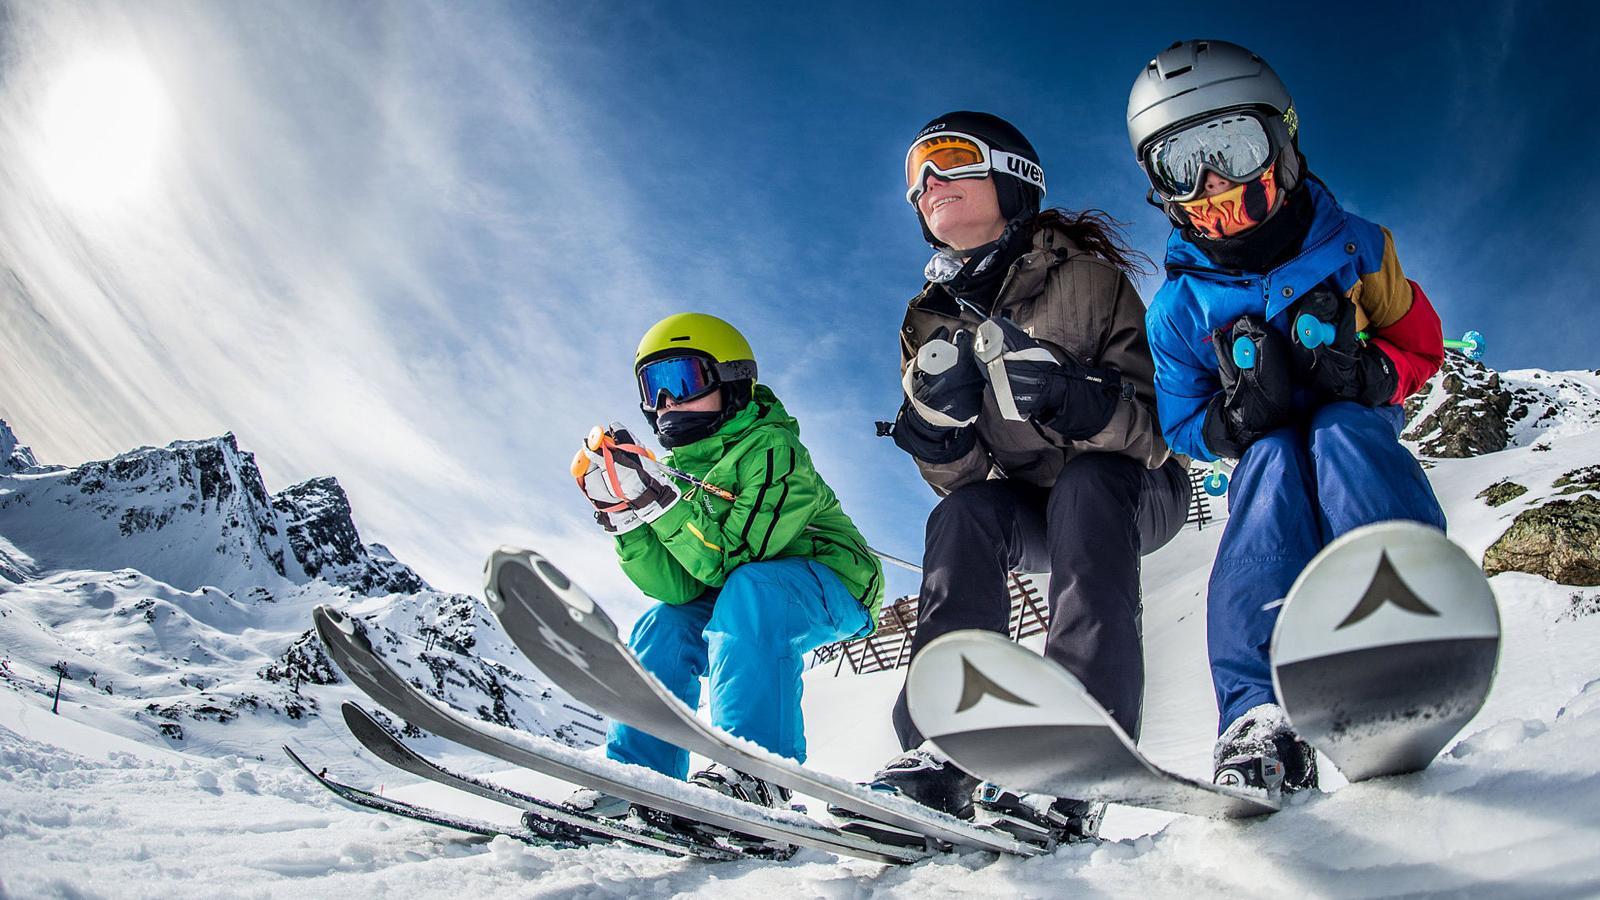 image de fond skieurs